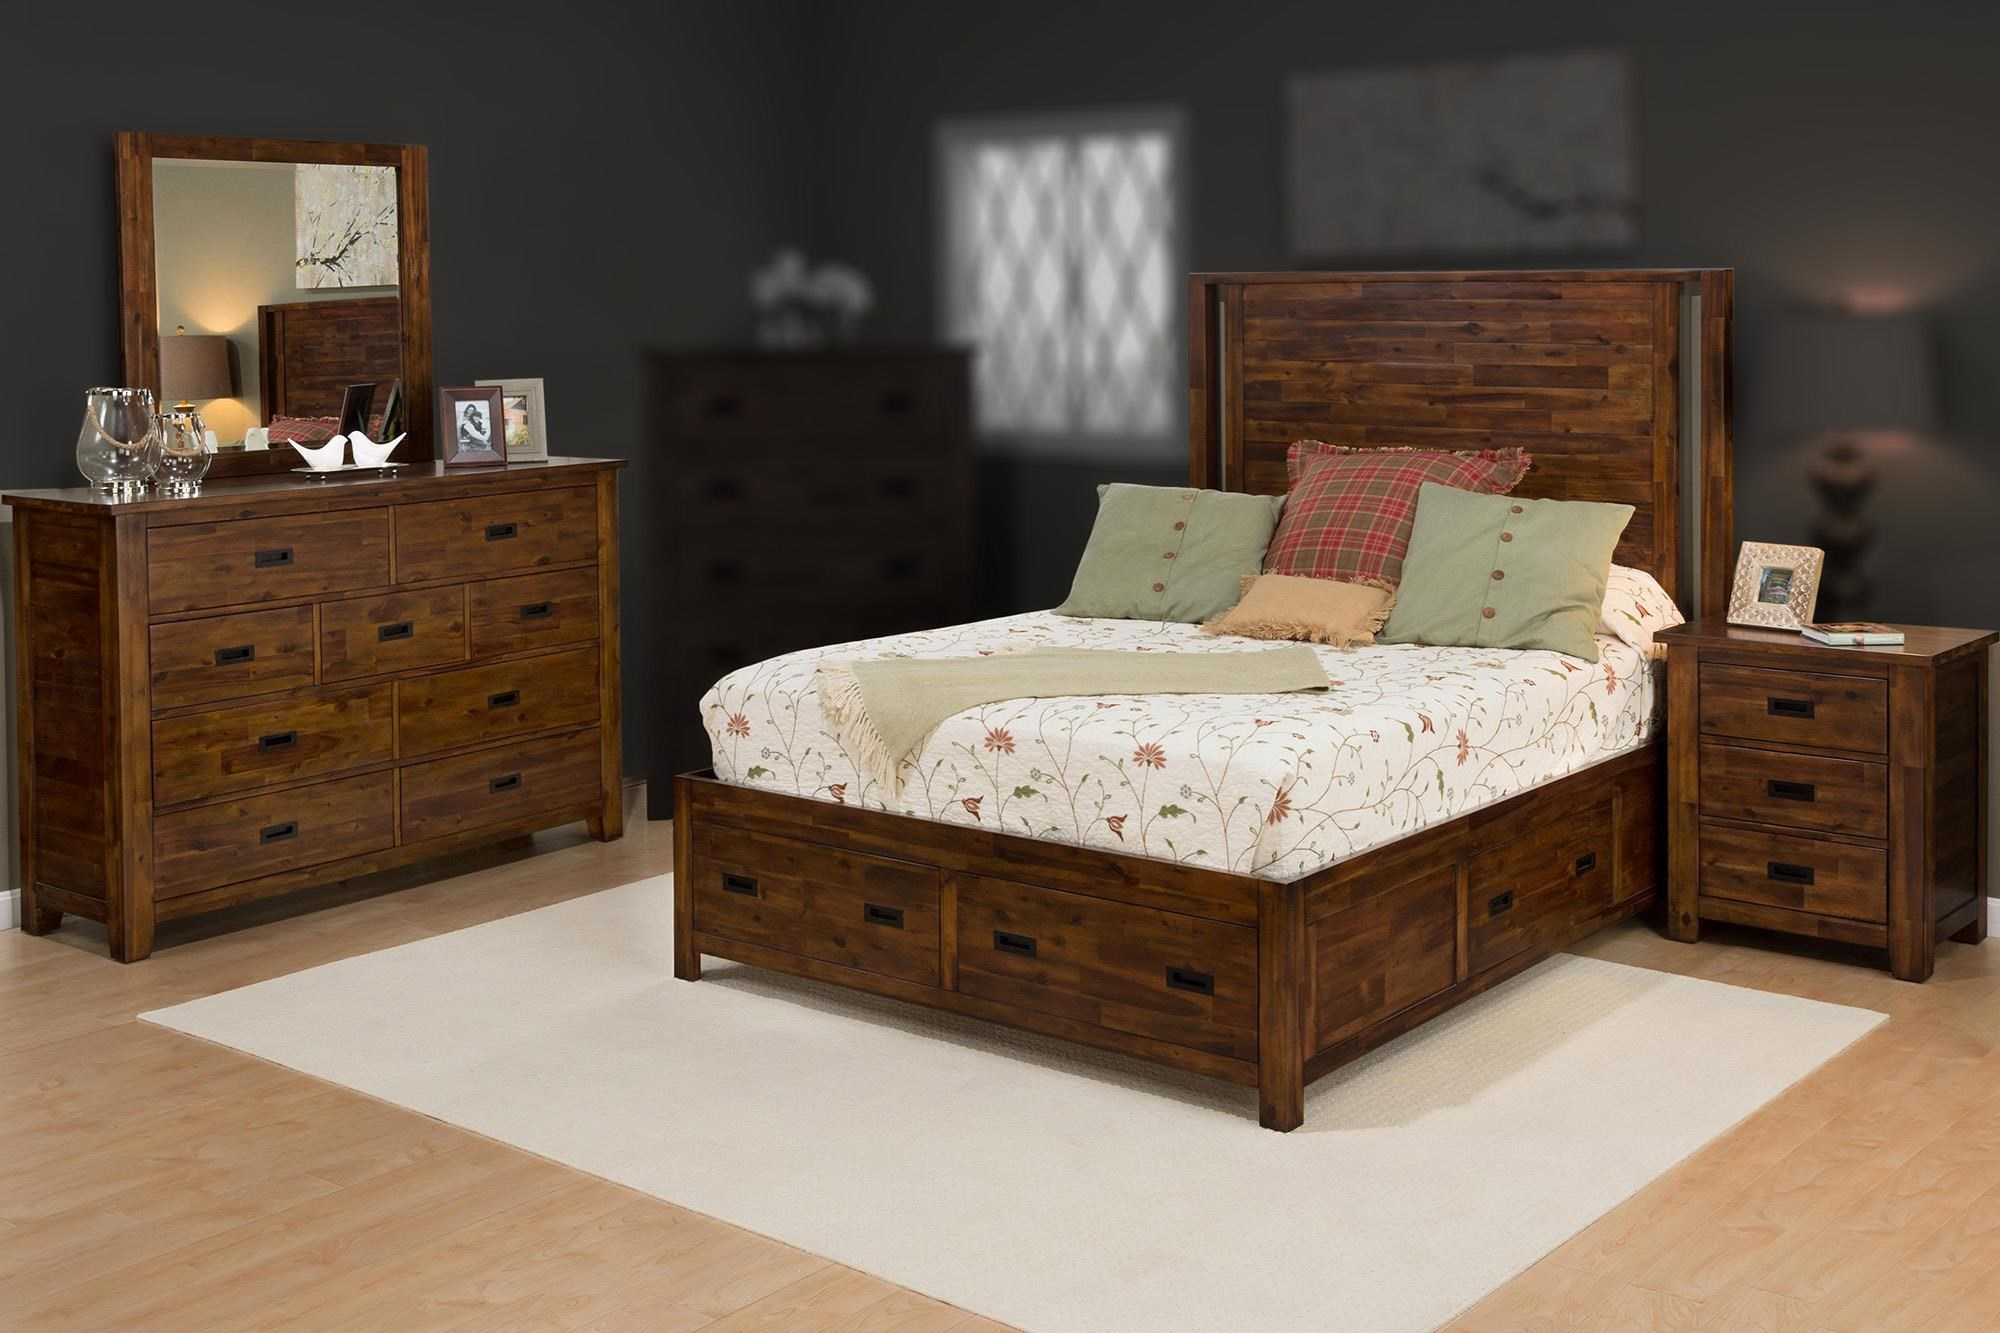 Jofran Coltran 4PC Queen Storage Bedroom Set - Item Number: 1503-QSBR-4PC